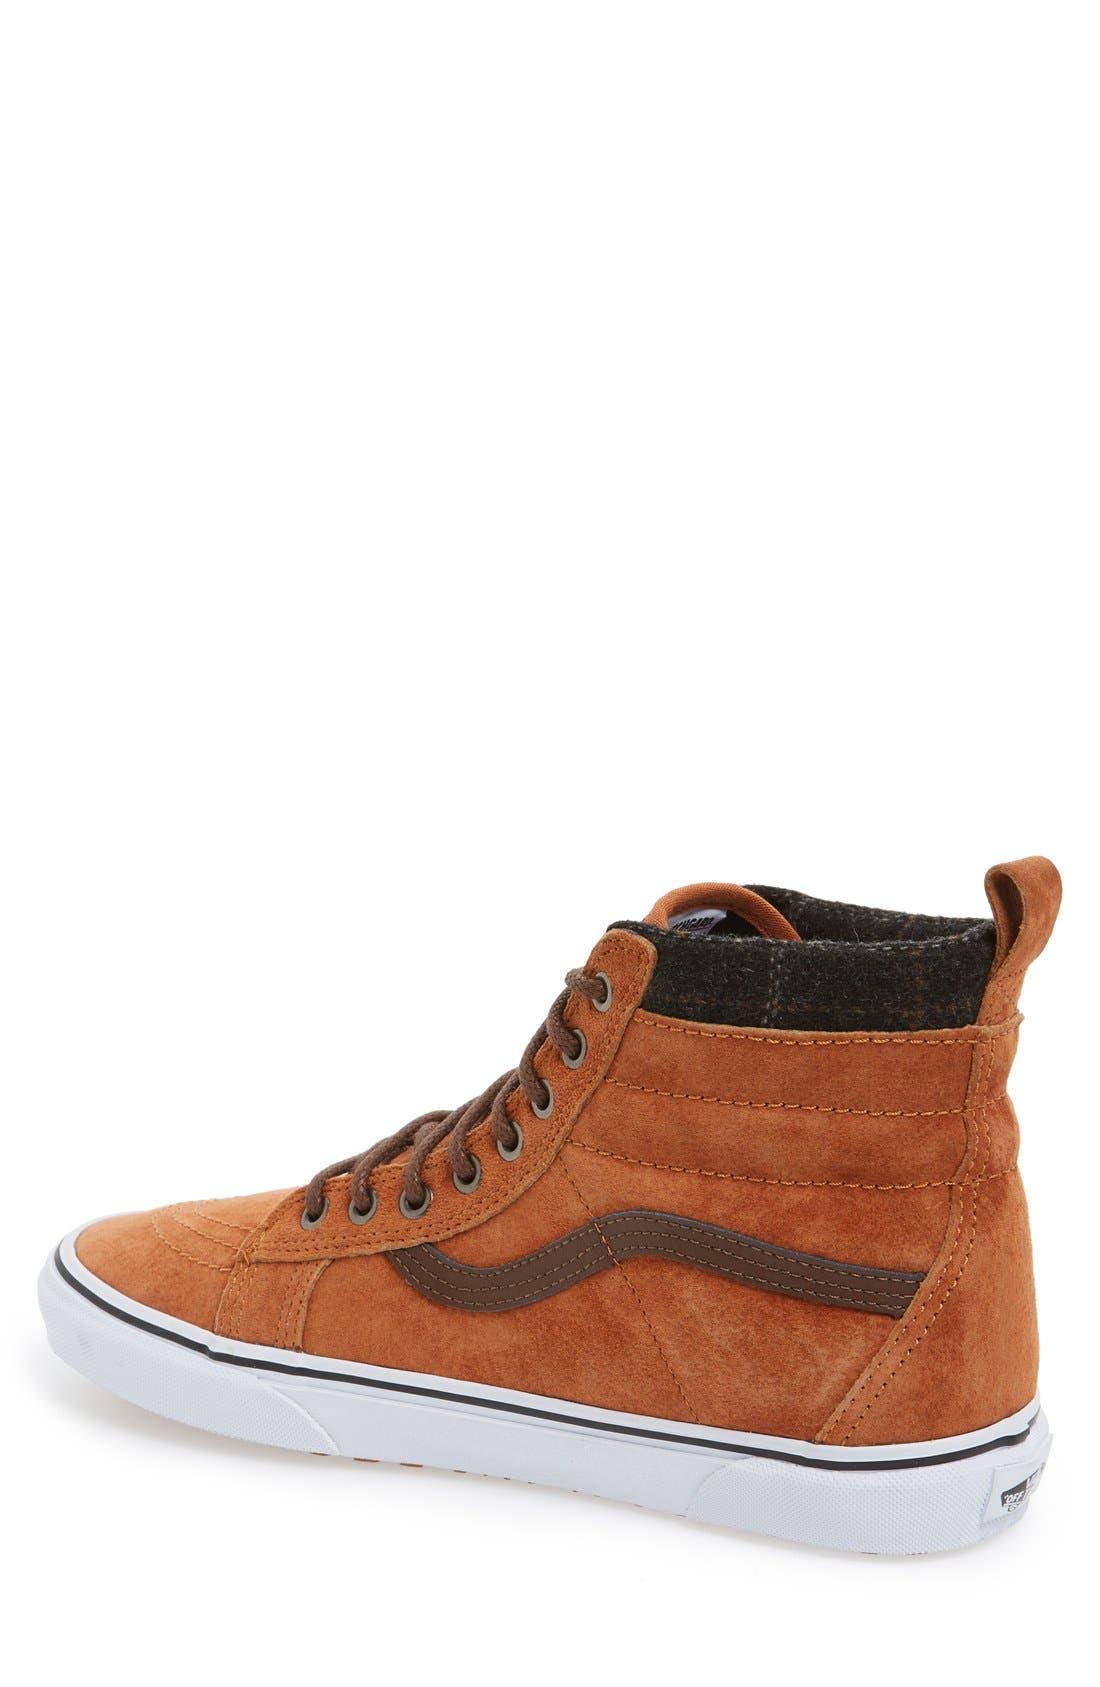 Alternate Image 2  - Vans 'Sk8-Hi MTE' Sneaker (Men)